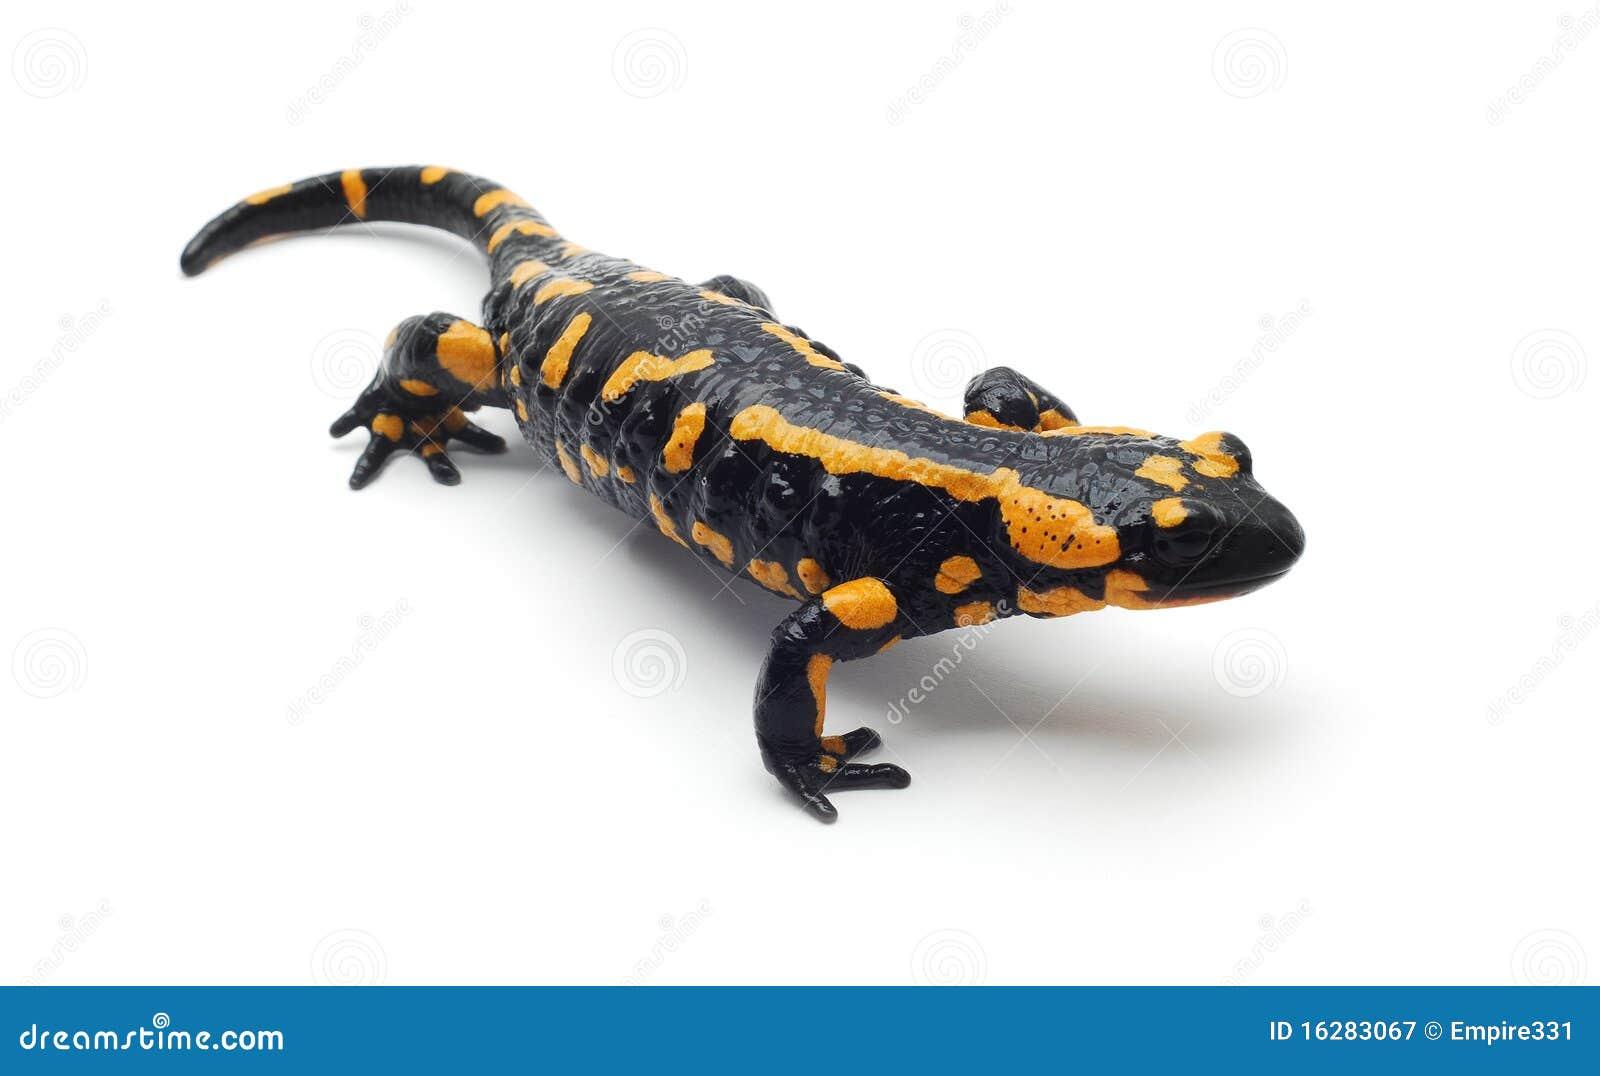 salamander white background - photo #42